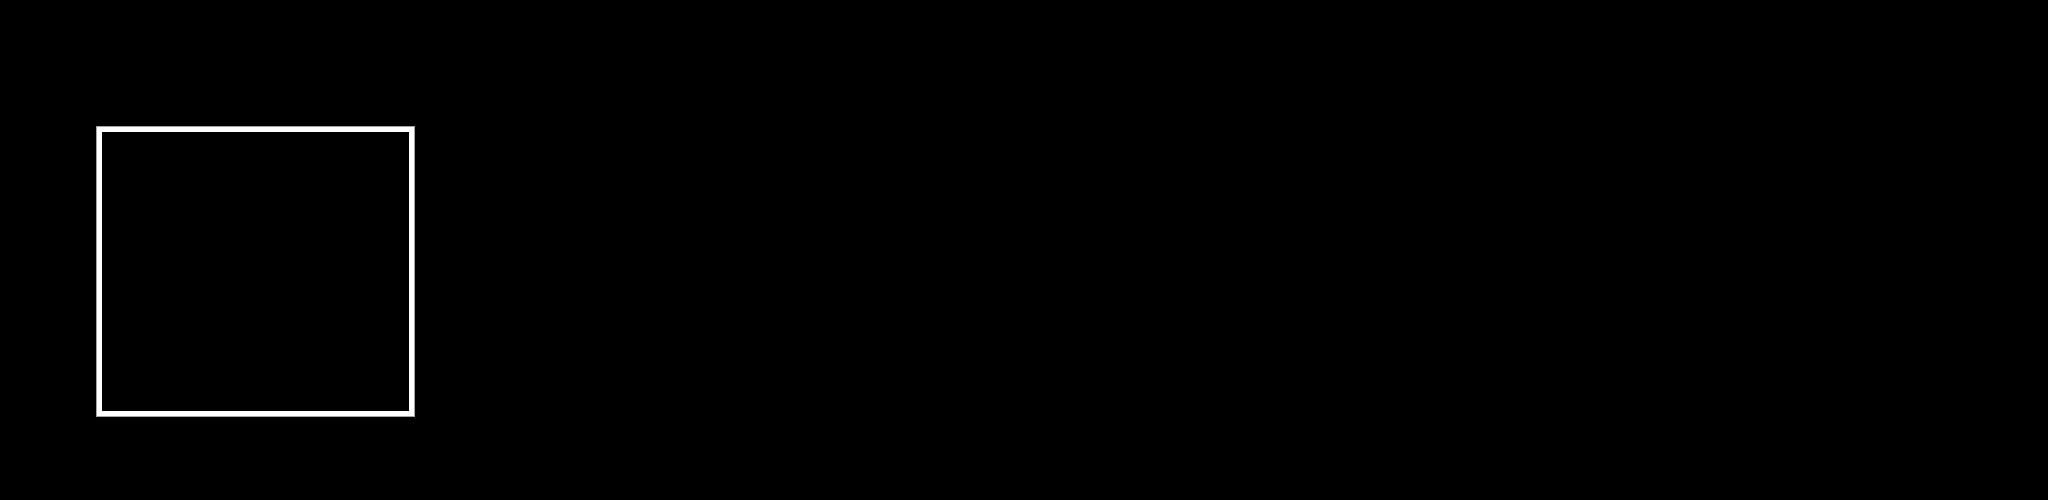 deirdre langan photography website logo